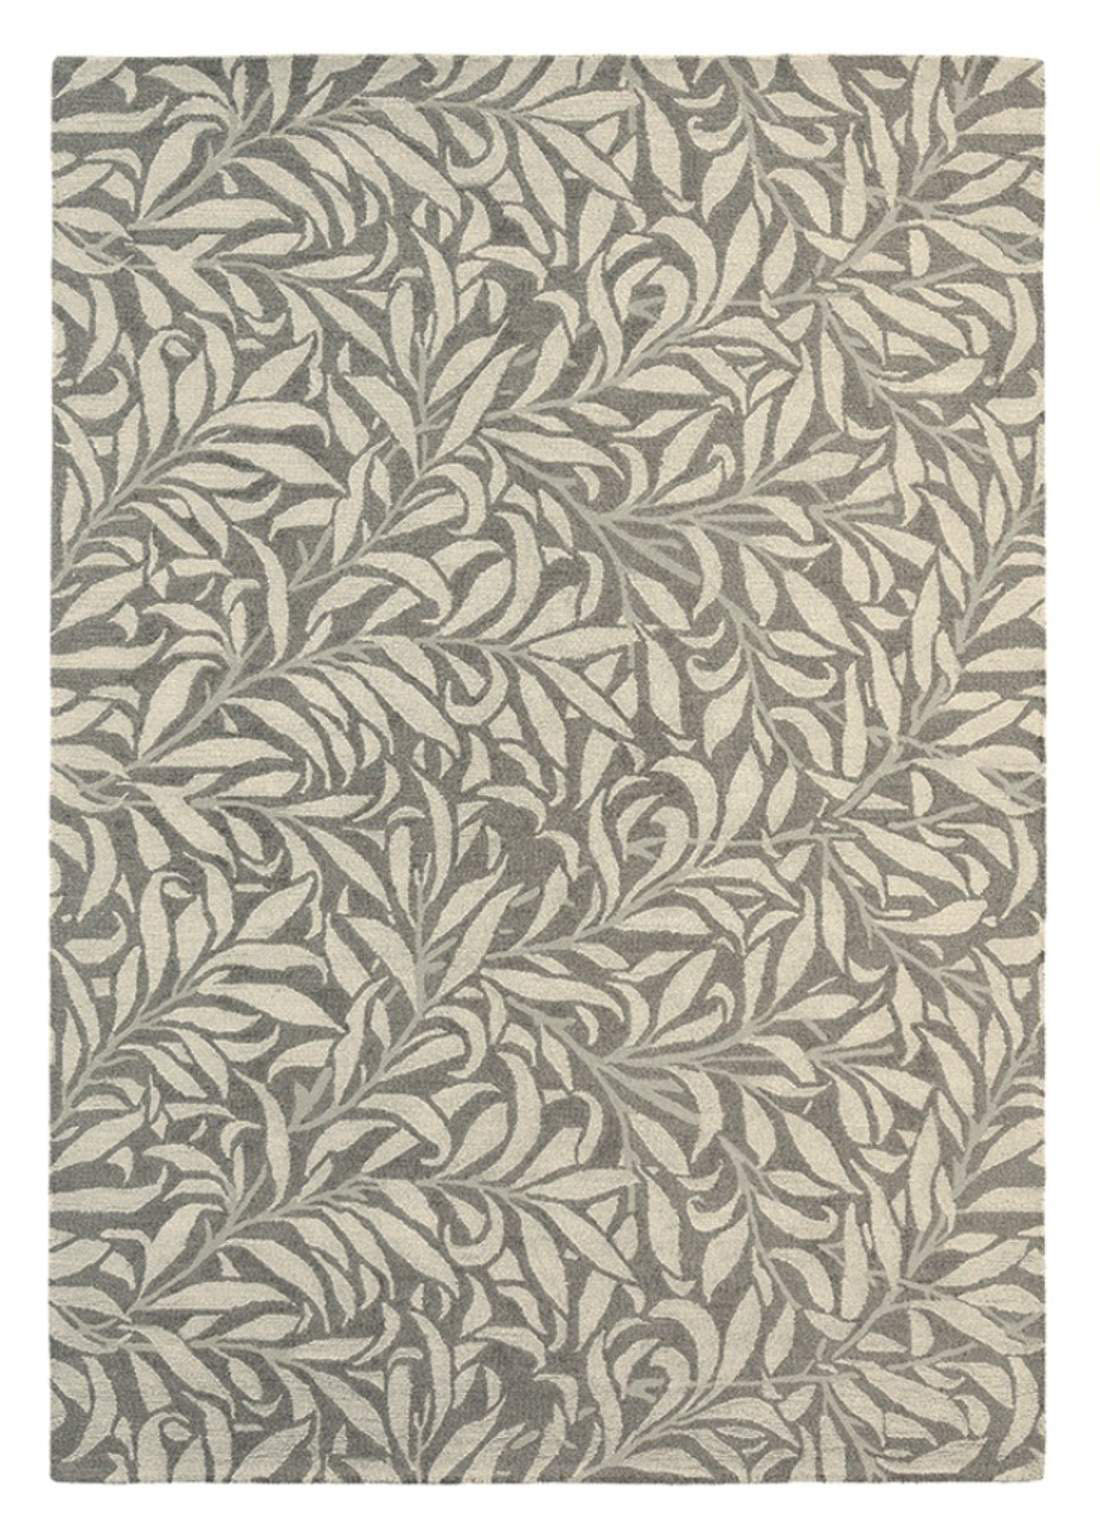 szaro beżowy dywan w kwiaty Willow Bough Mole 28304